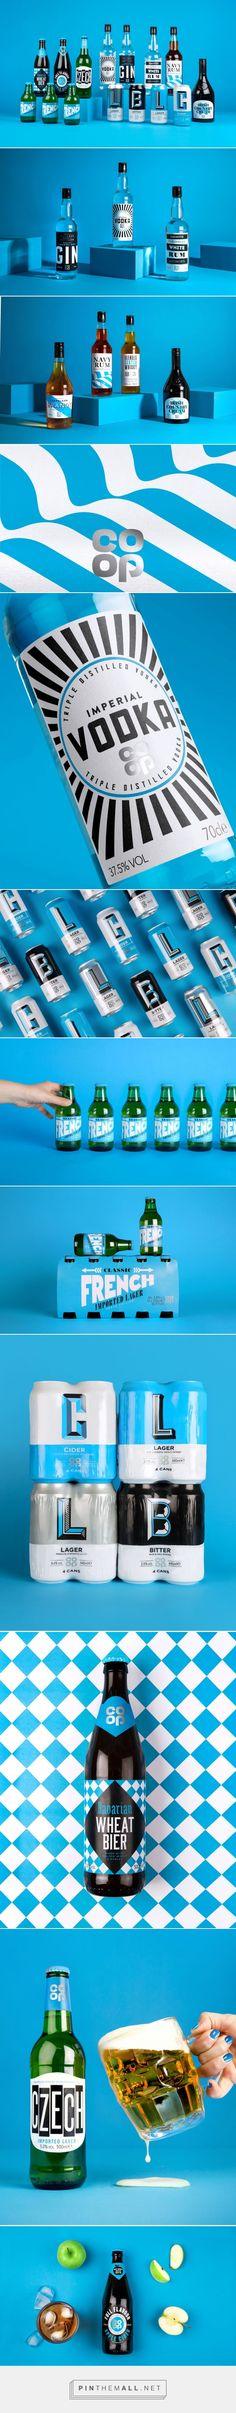 Co-op Beers, Ciders and Spirits packaging design by Robot Food - https://www.packagingoftheworld.com/2018/06/co-op-beers-ciders-and-spirits.html